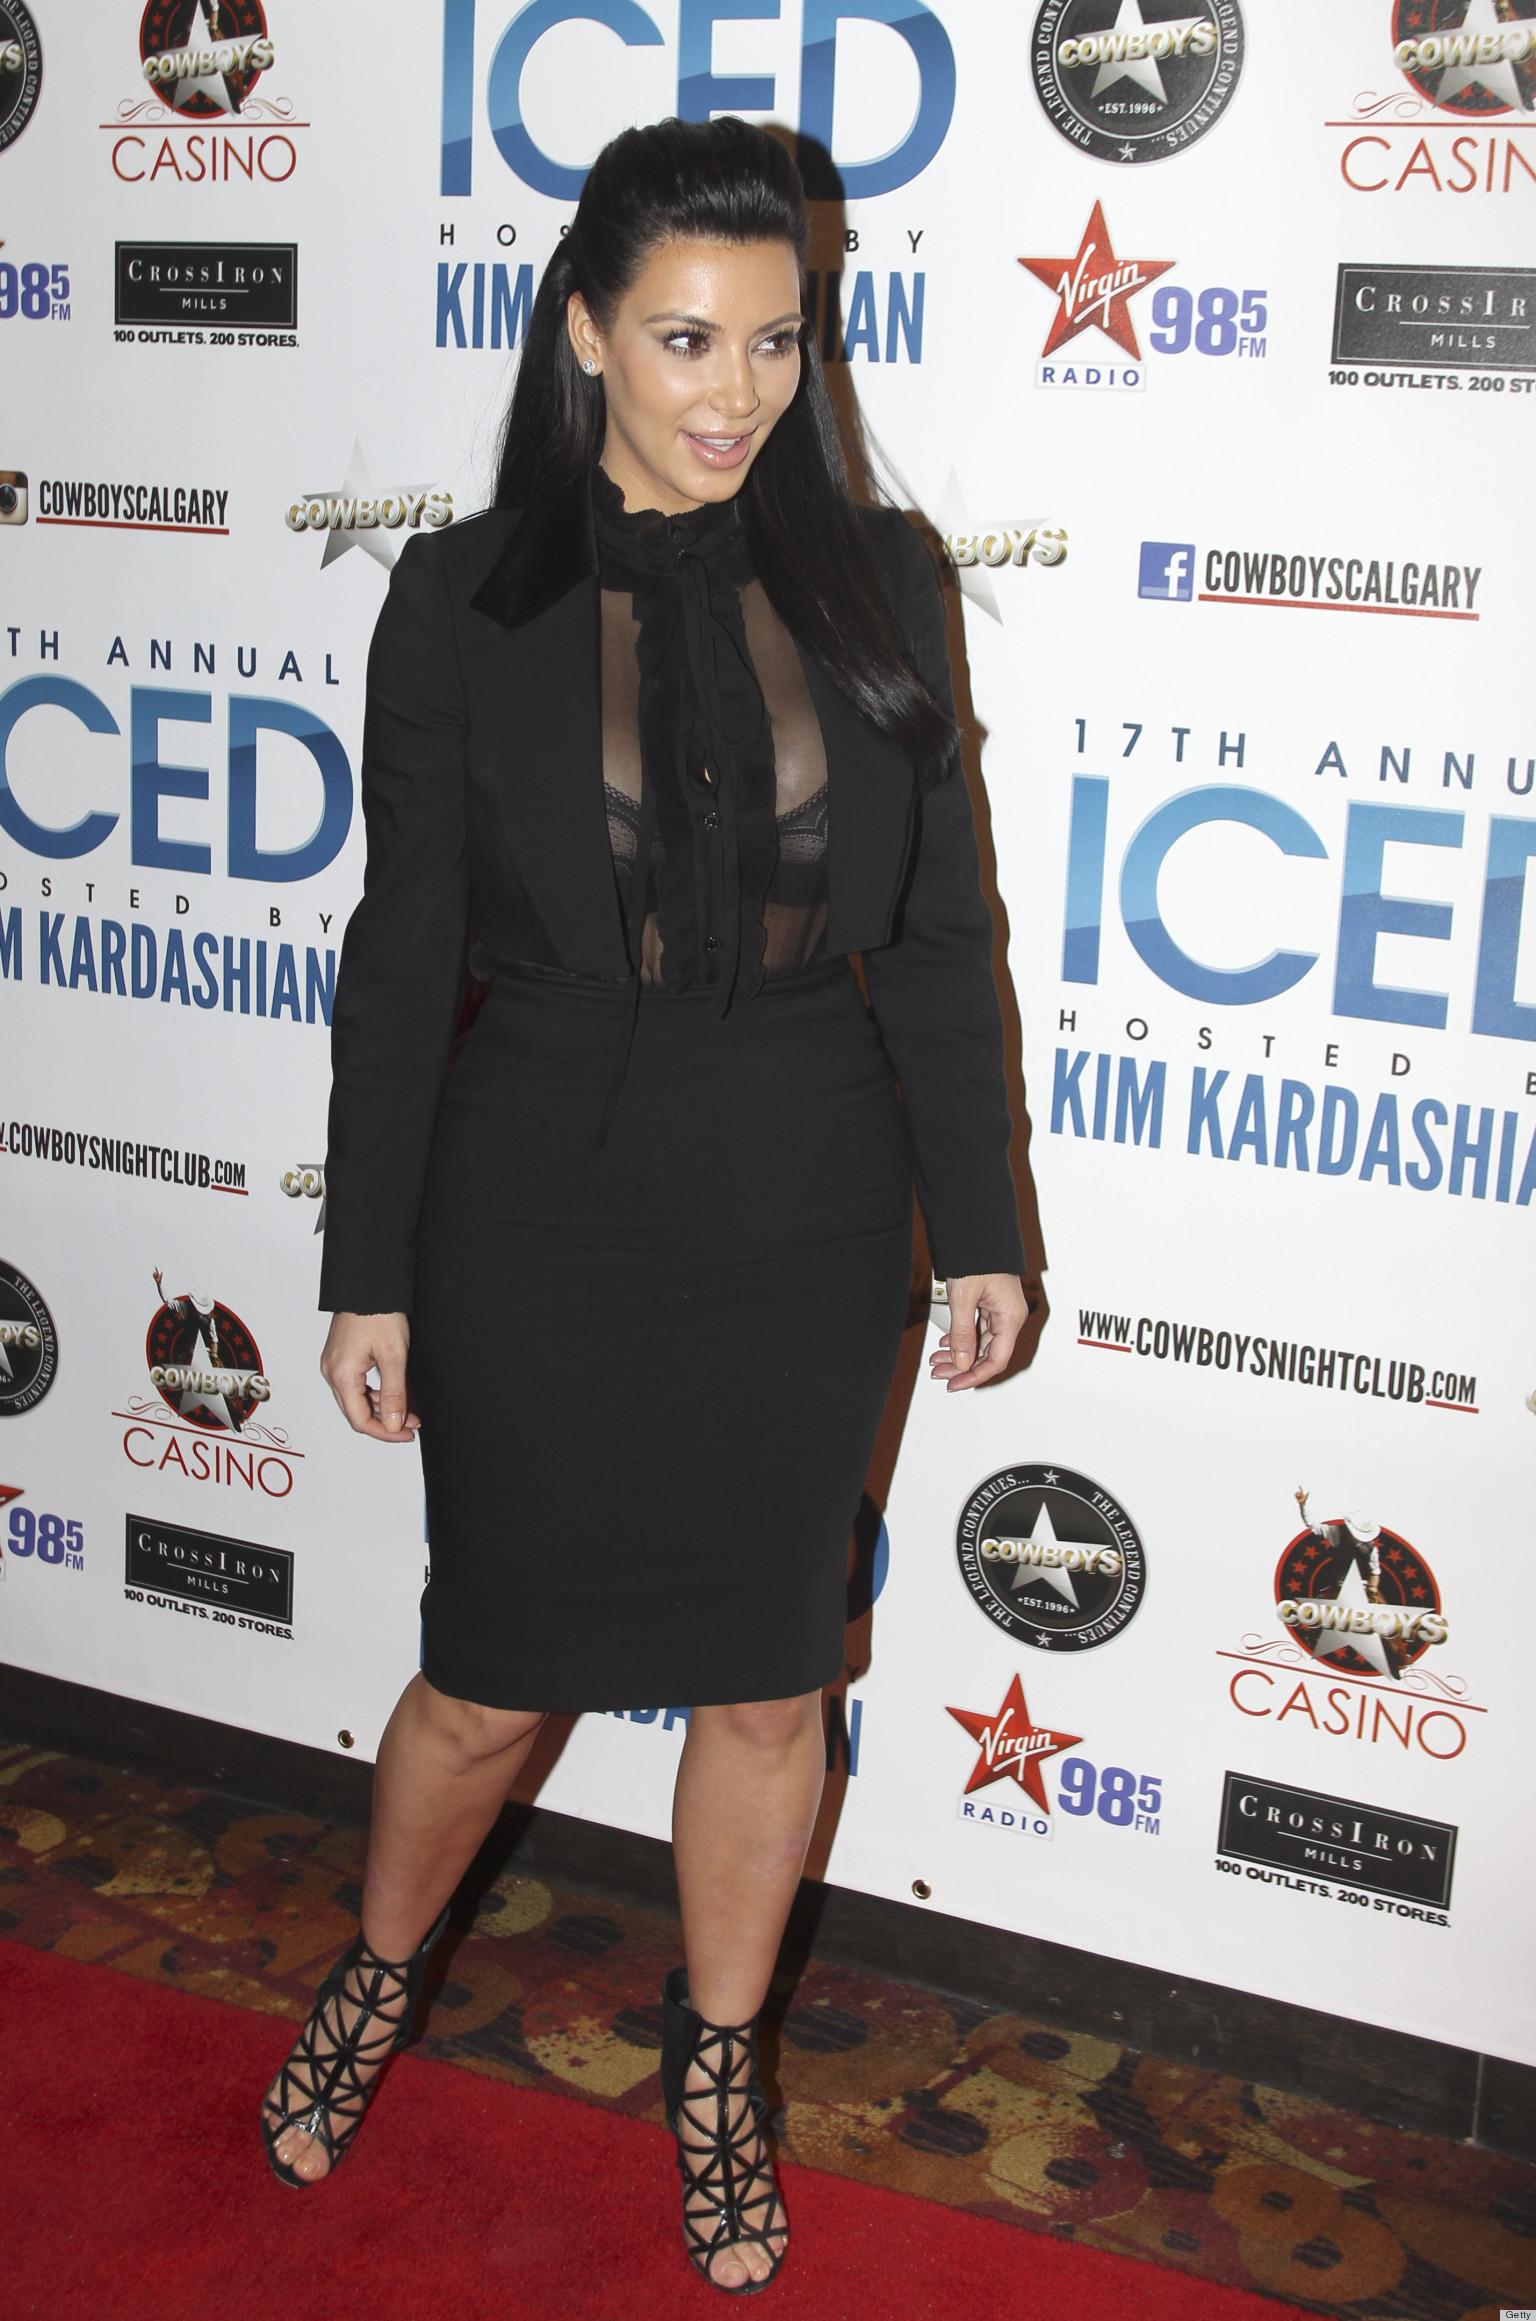 Kim Kardashian Pregnancy Style Proves Sexy Sheer Looks